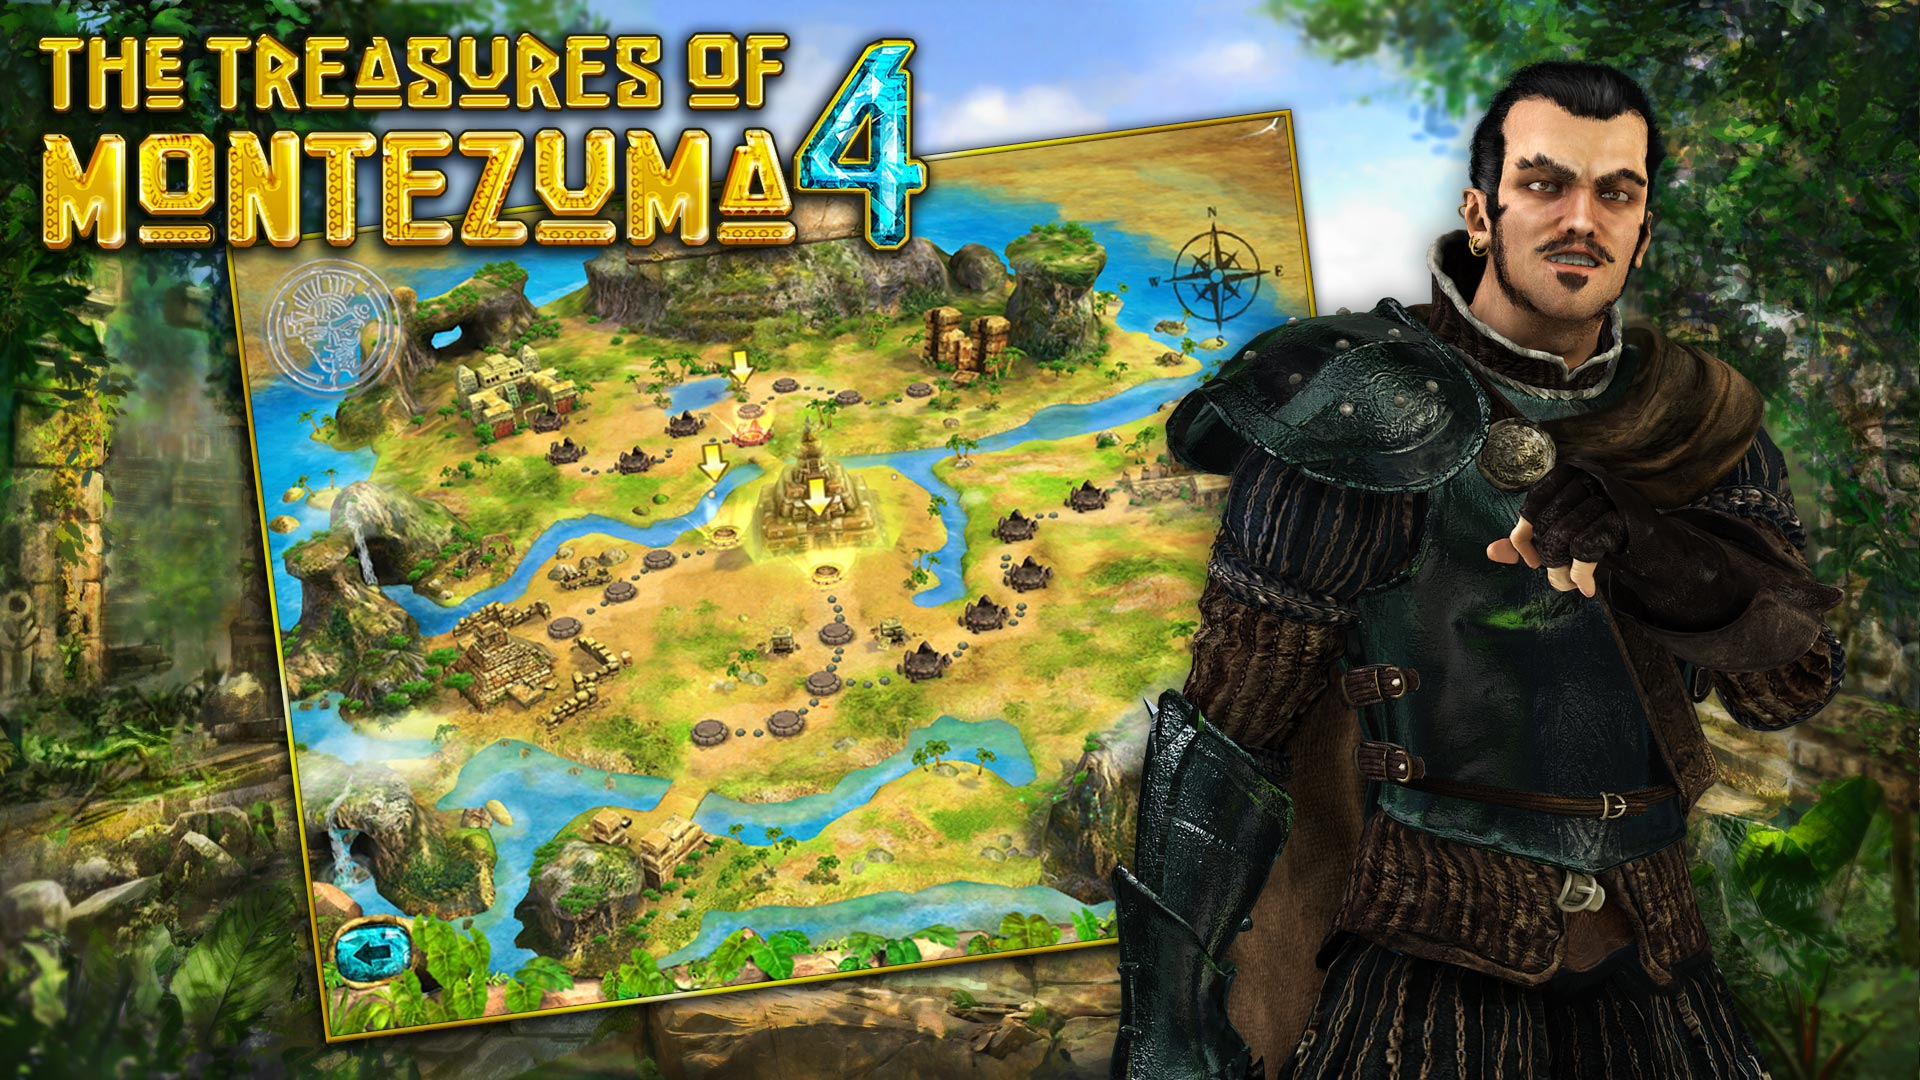 Treasure Of Montezuma